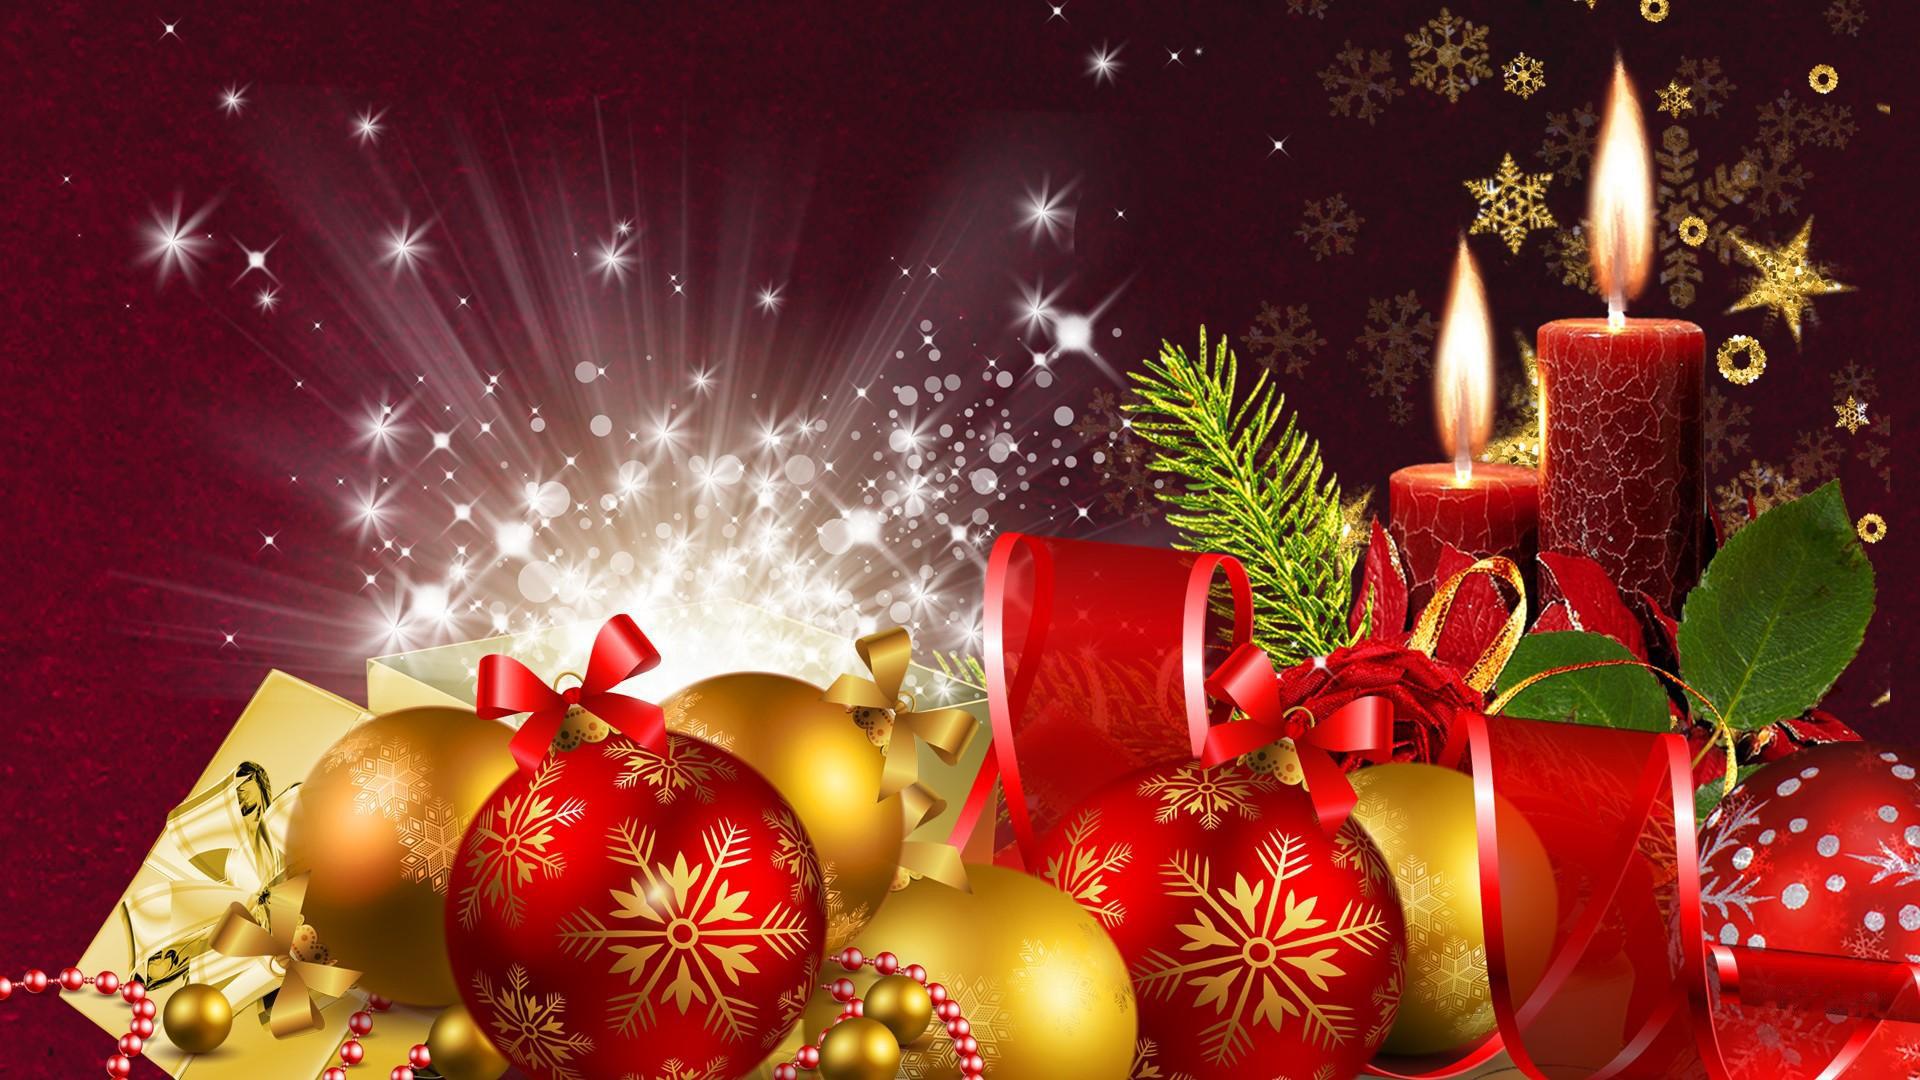 happy christmas tree lights balls gifts best hd wallpaper